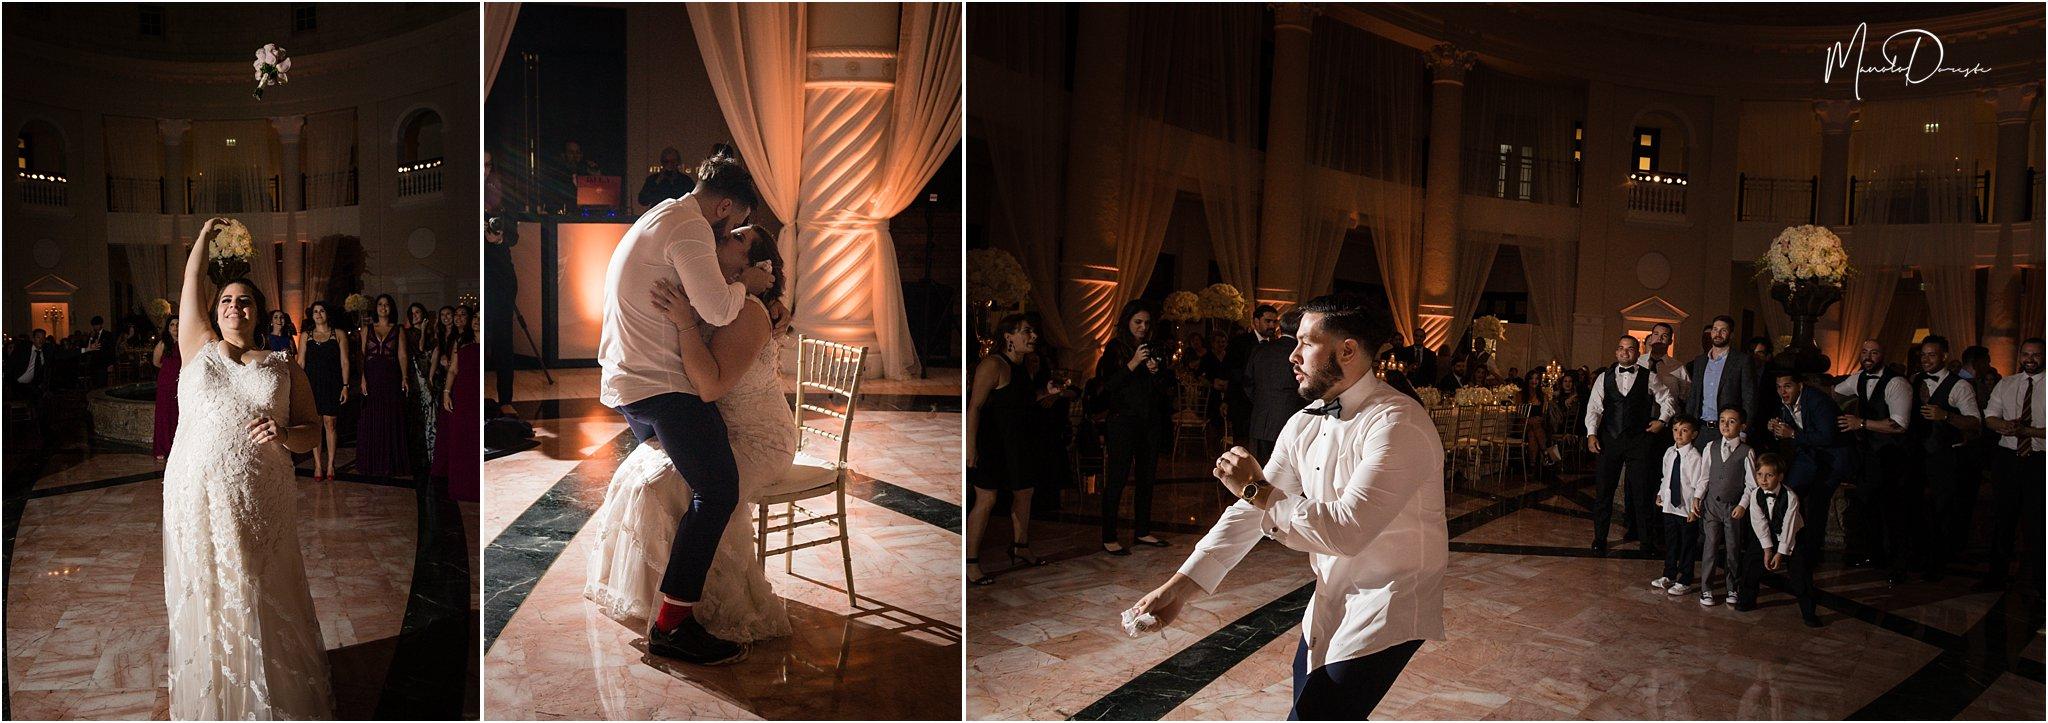 0378_ManoloDoreste_InFocusStudios_Wedding_Family_Photography_Miami_MiamiPhotographer.jpg